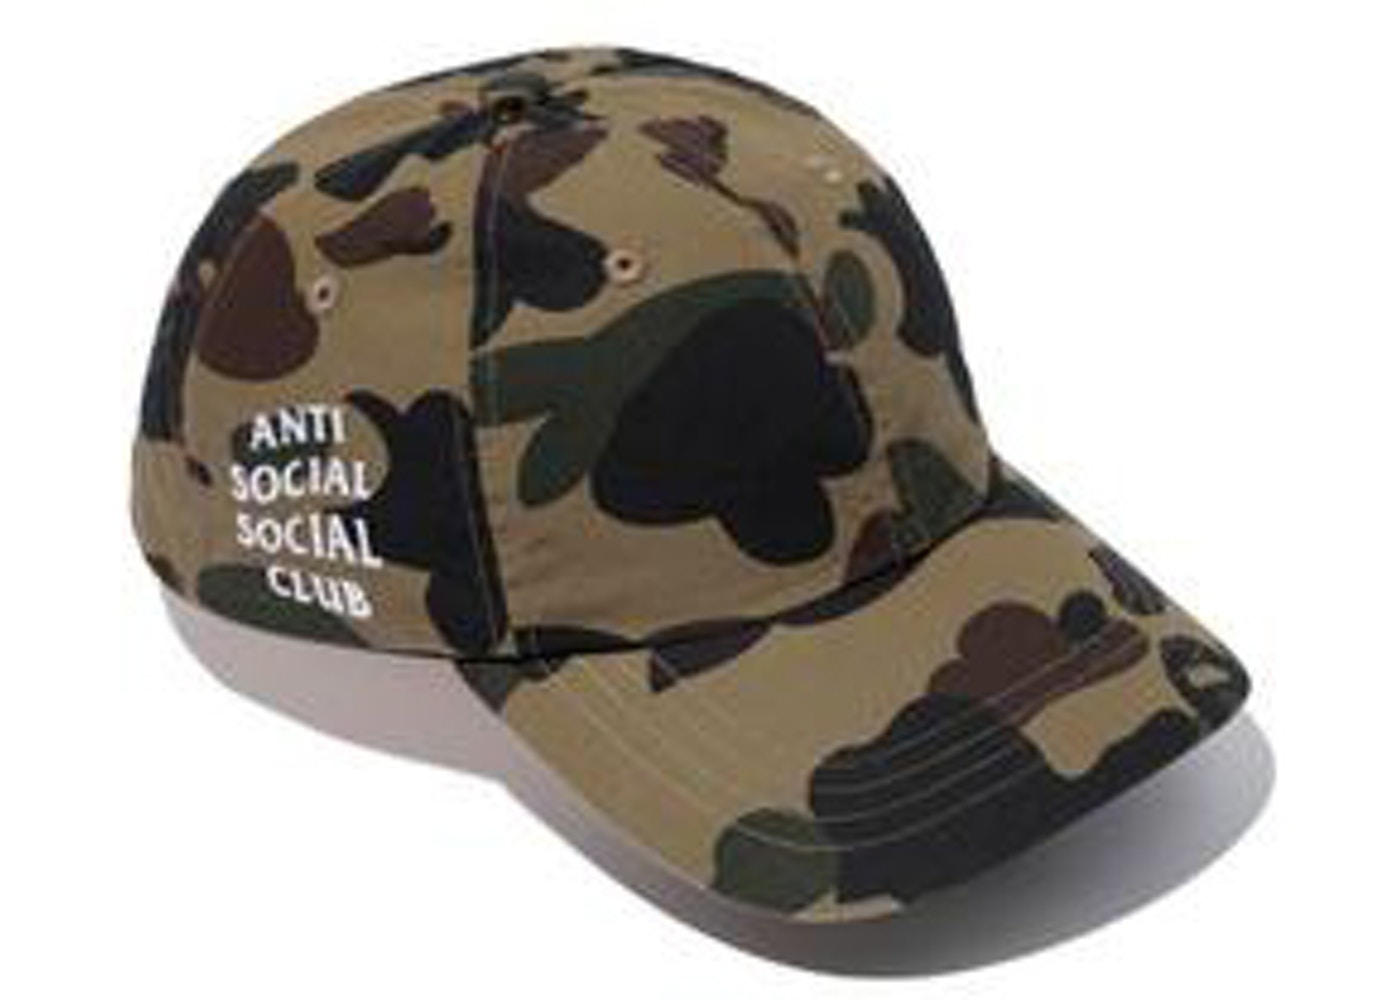 cb34670b961e Streetwear - Bape Headwear - Average Sale Price